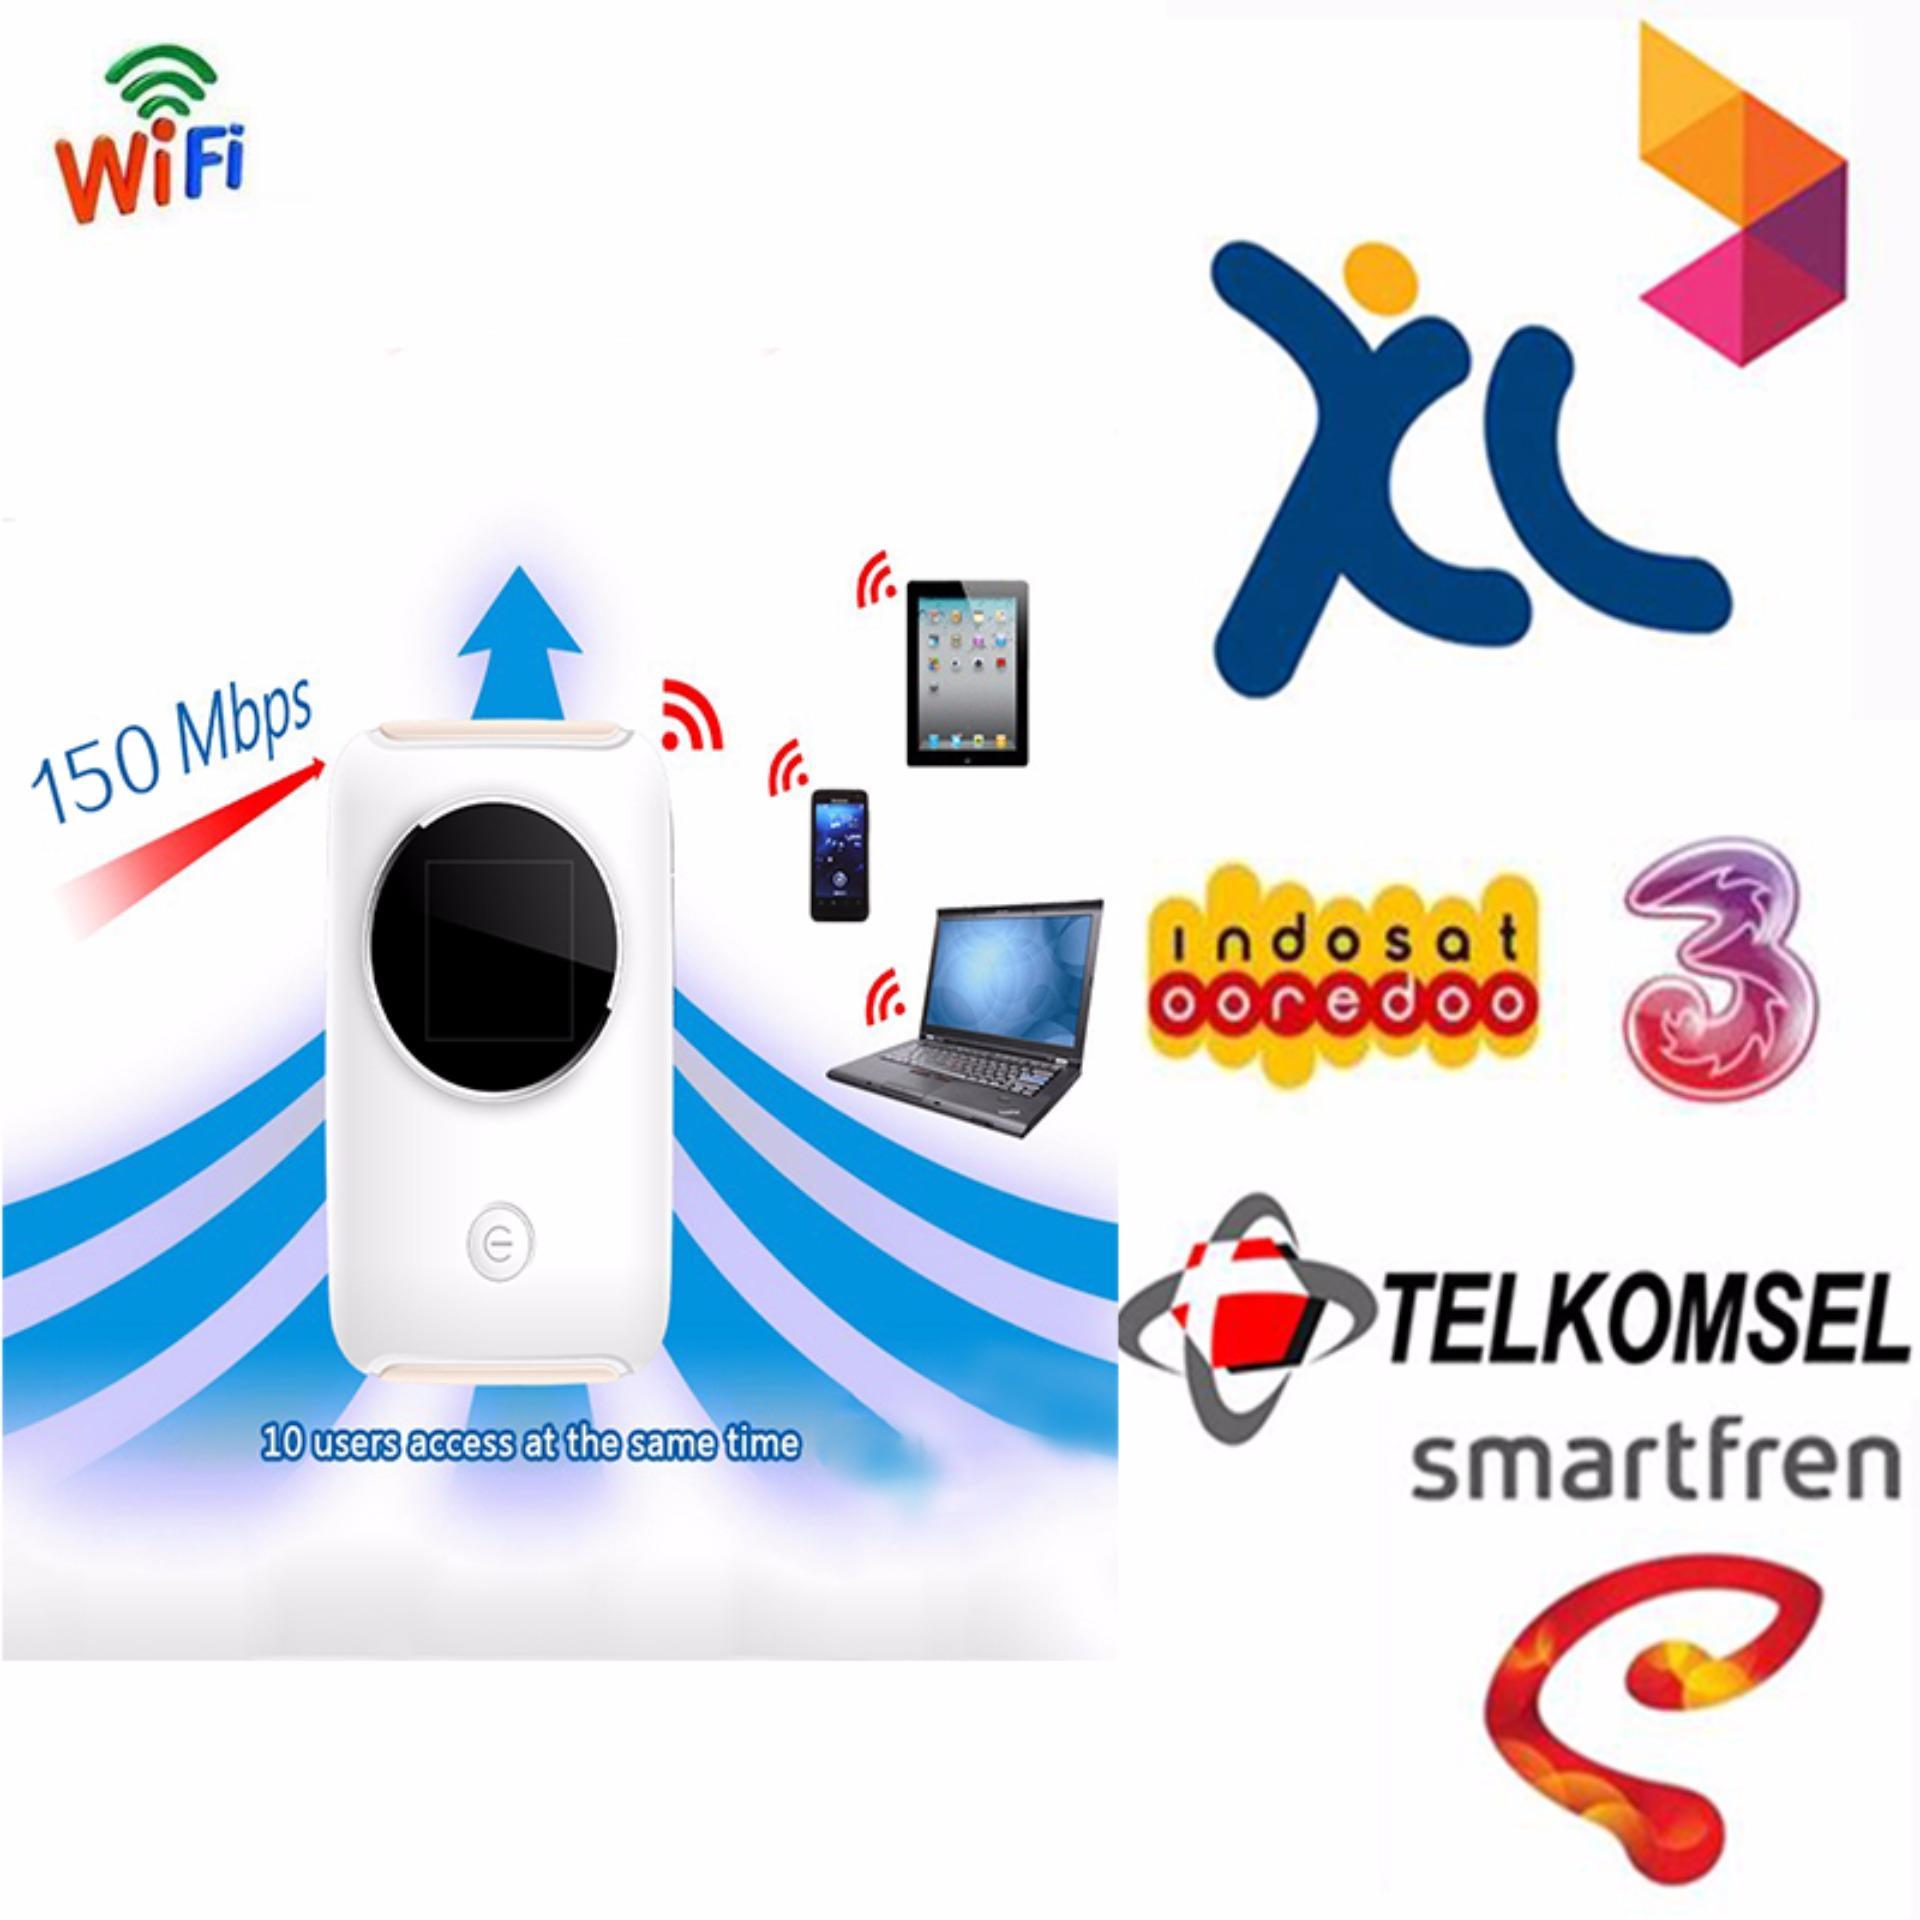 ... 4G Wifi Router 150Mbps Hotspot Car Mifi Modem Broadband 4G Wi-FiRouter Supporting 3, ...